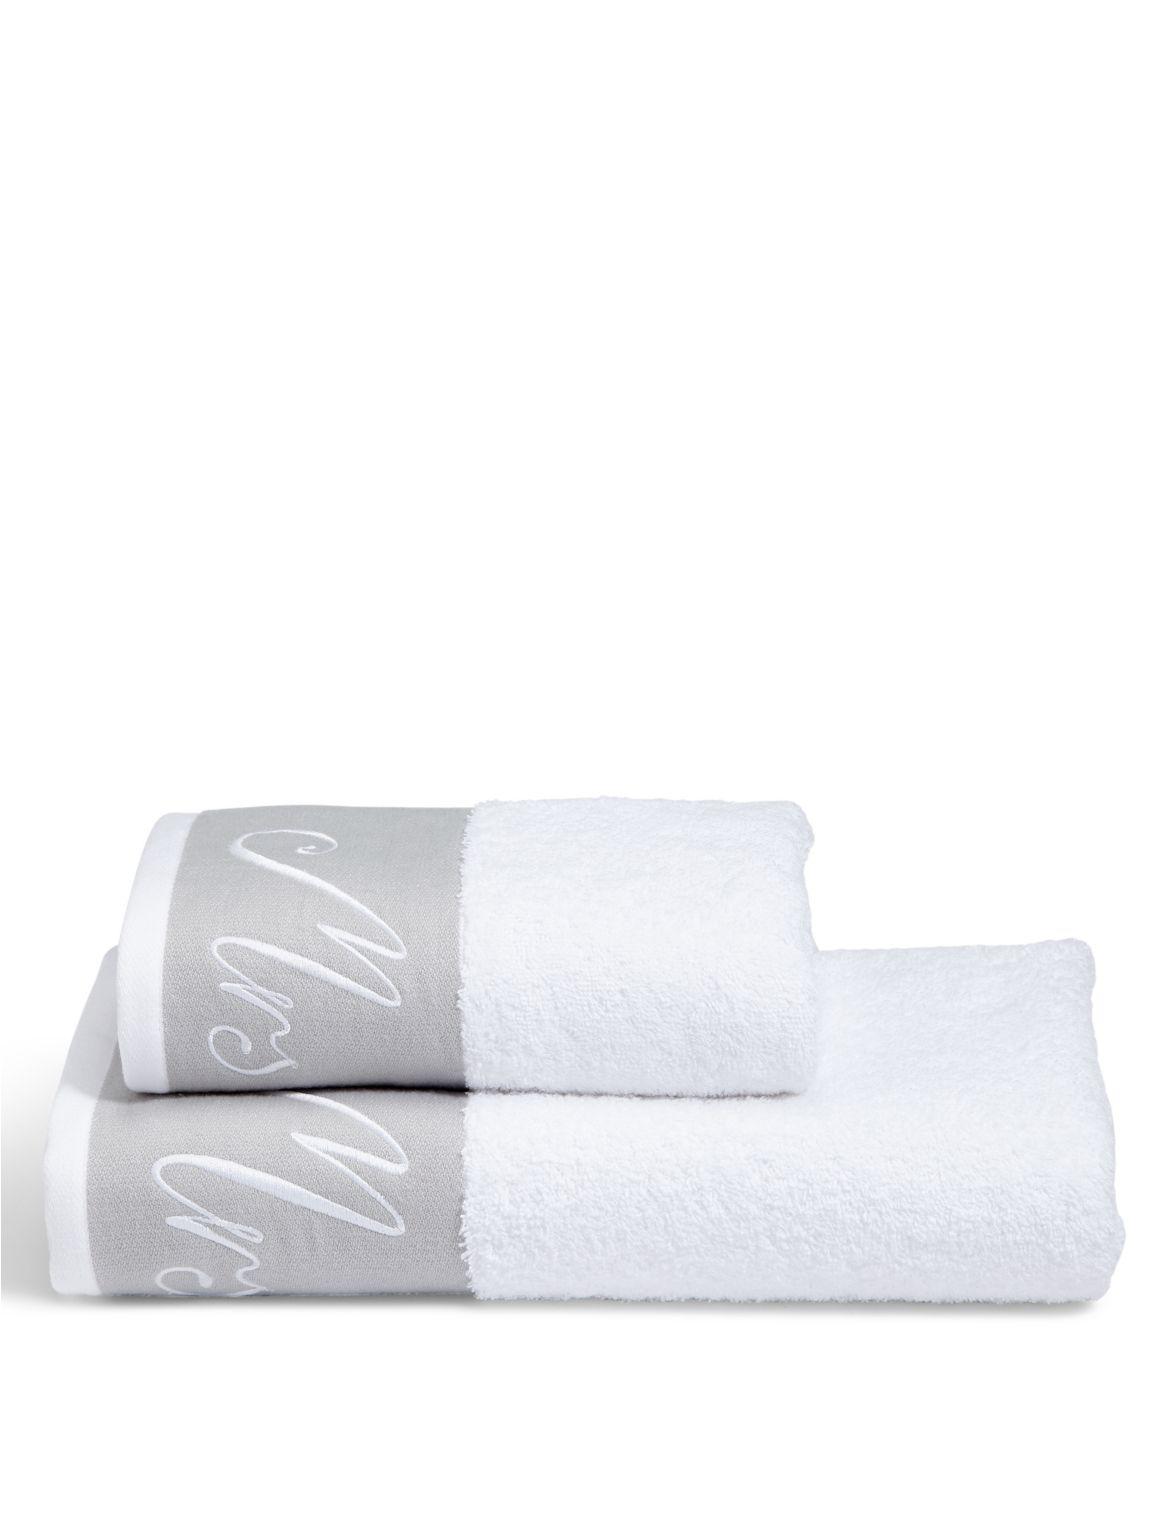 Marks and Spencer - Serviette avec texte «mrs» brodé